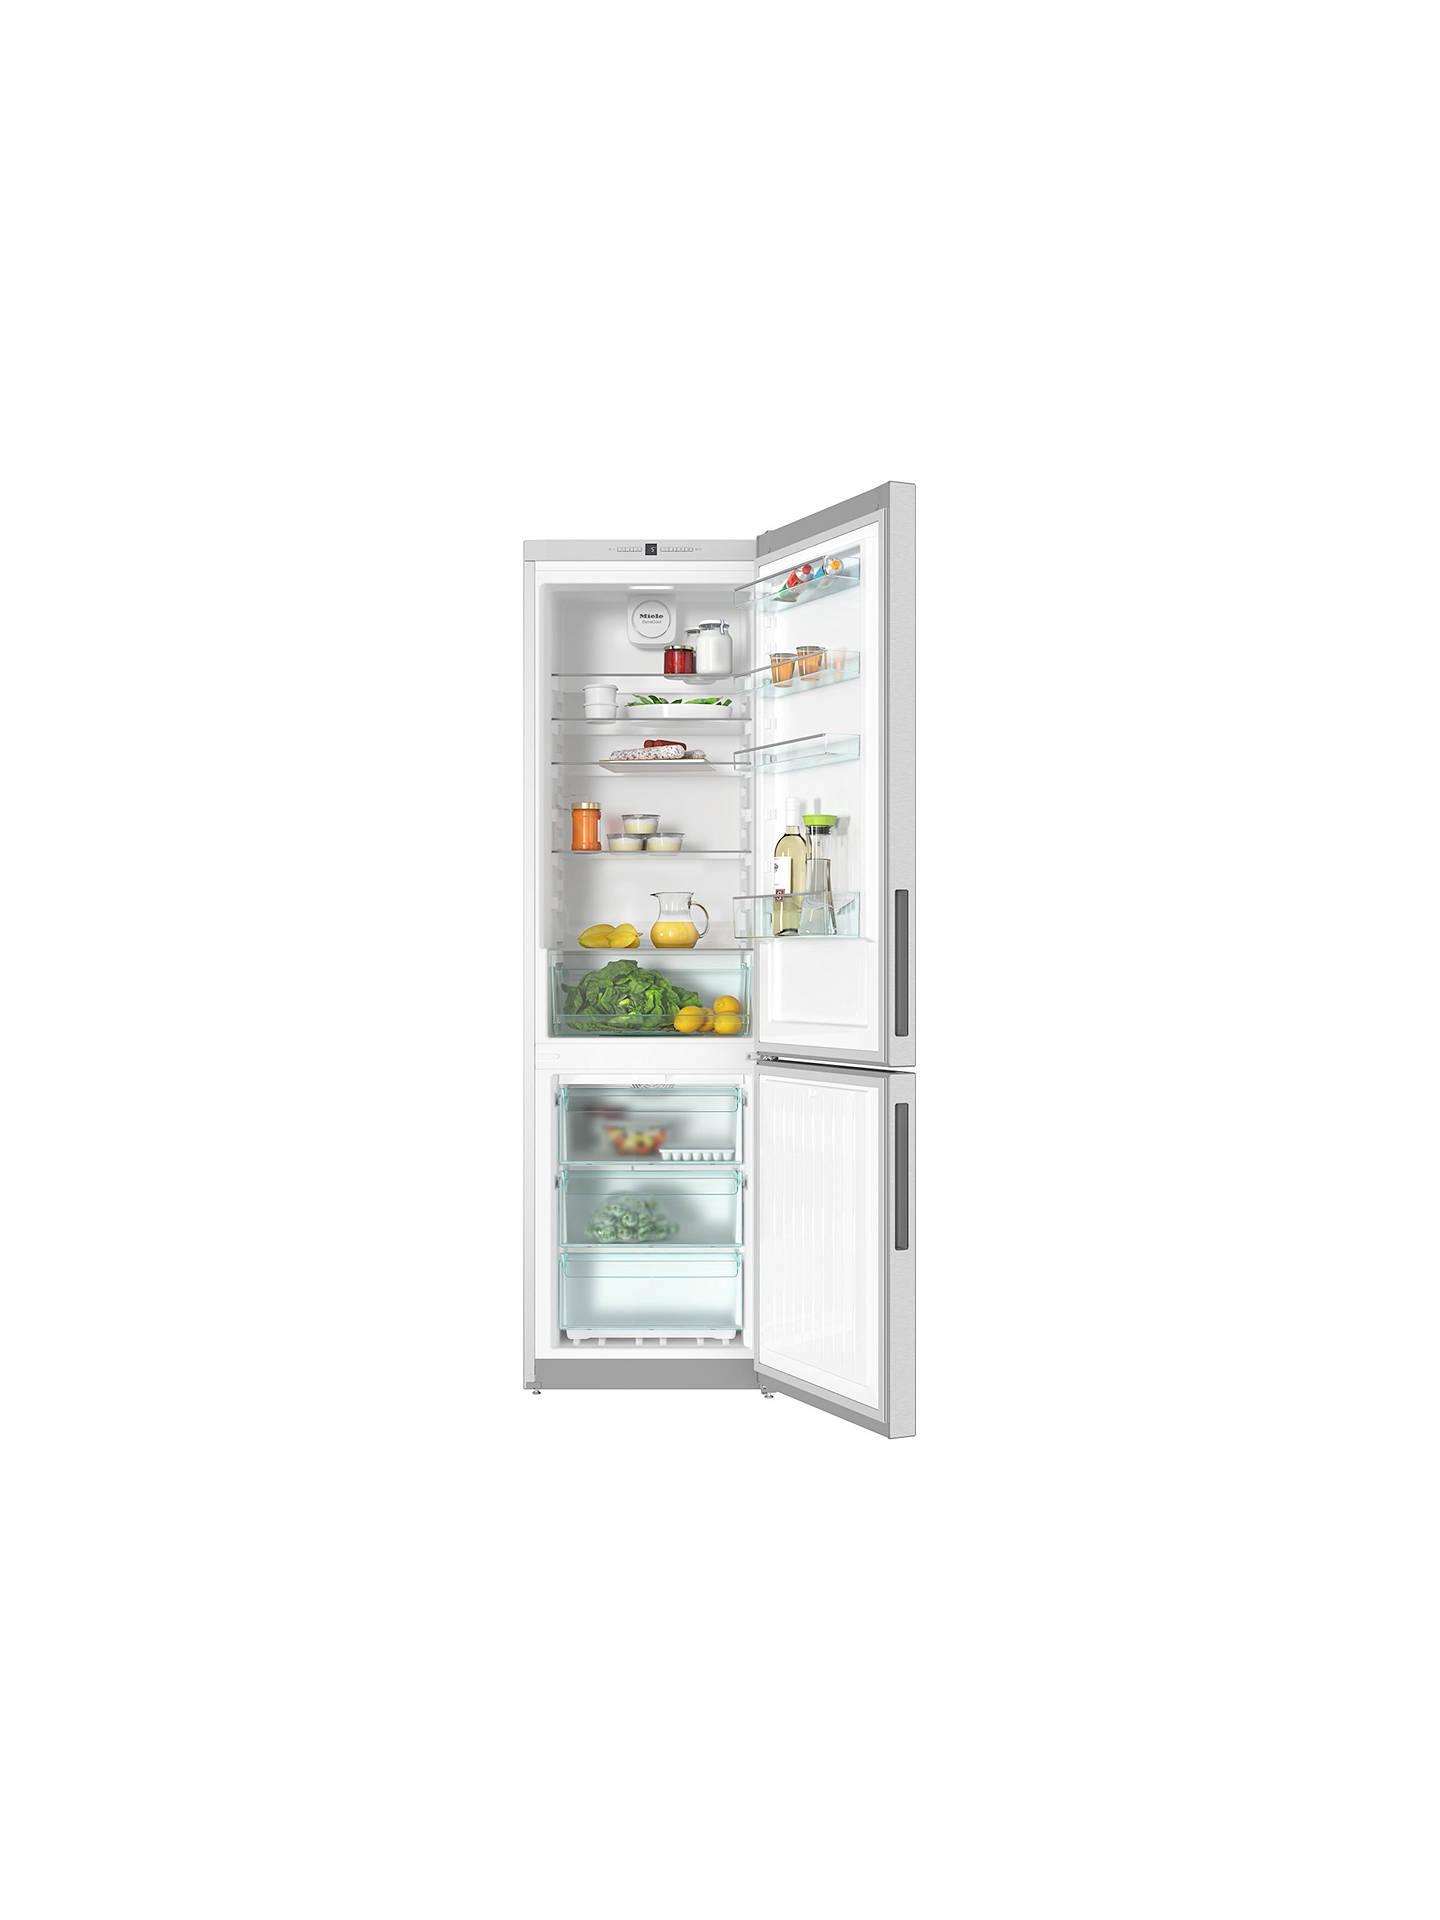 Miele Kfn29132d Freestanding Fridge Freezer A Energy Rating 60cm - Miele-grand-froid-4-door-refrigerator